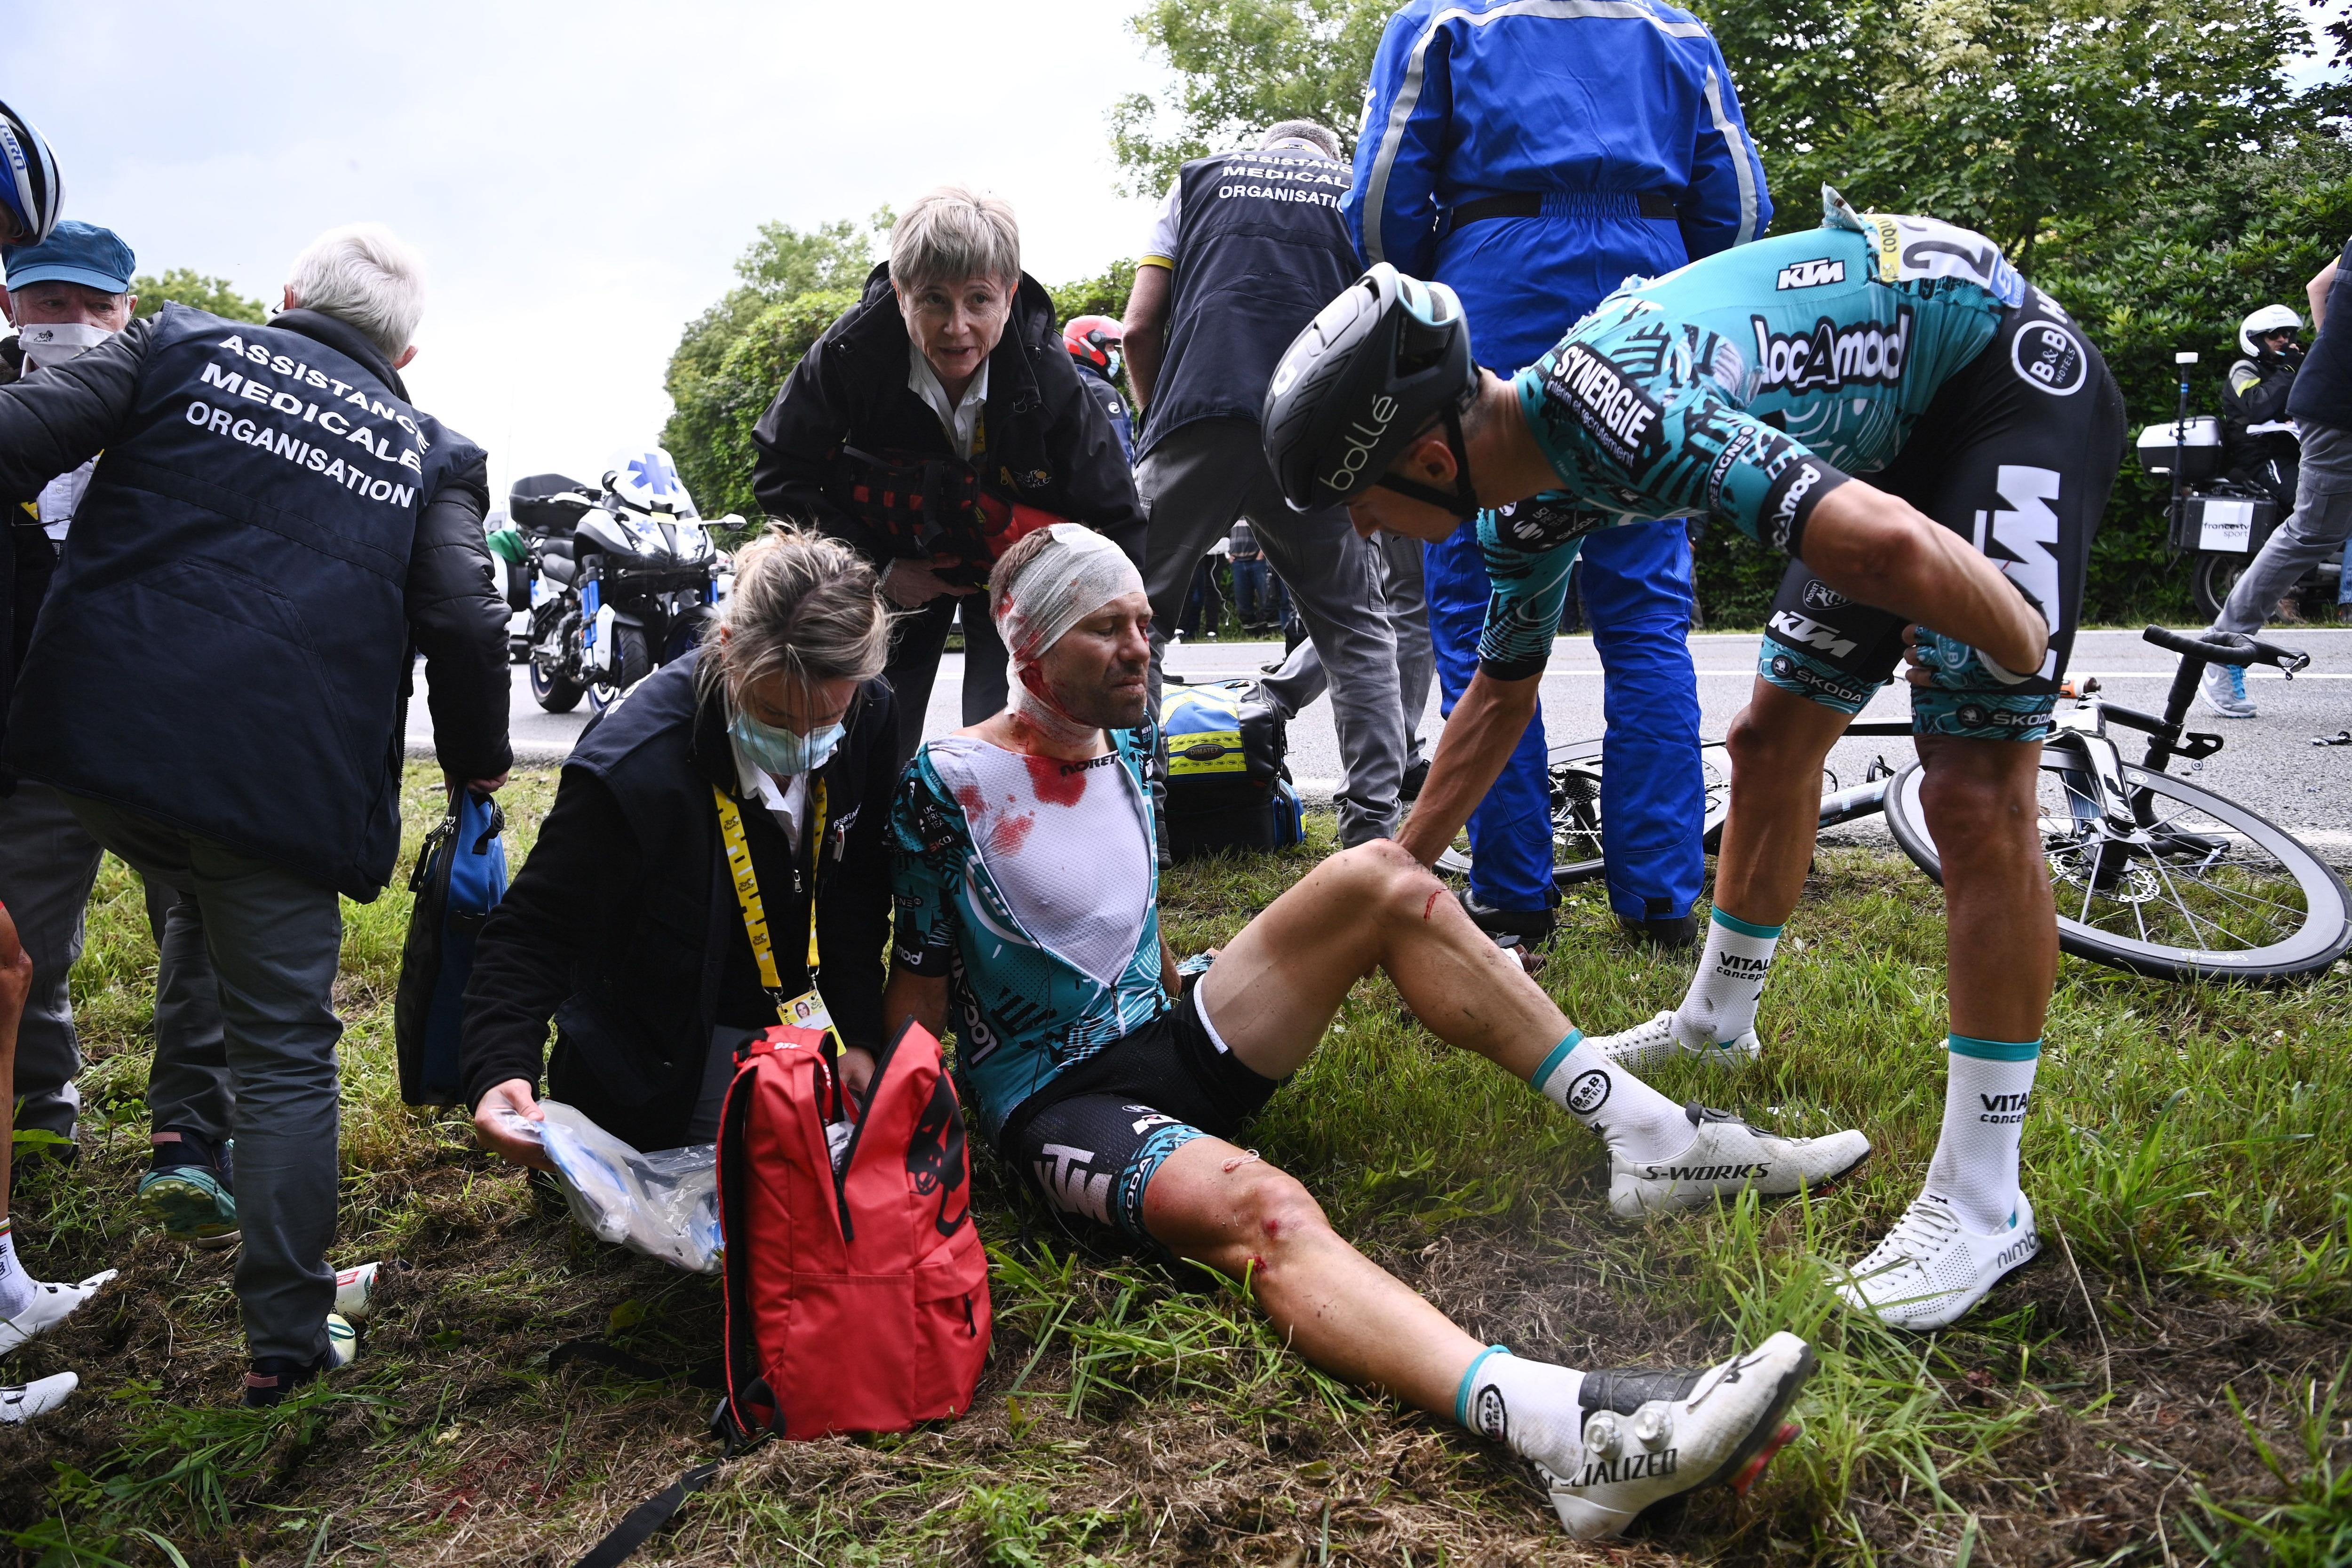 El francés Cyril Lemoine recibe atención médica tras la caída (REUTERS/Anne-Christine Poujoulat)